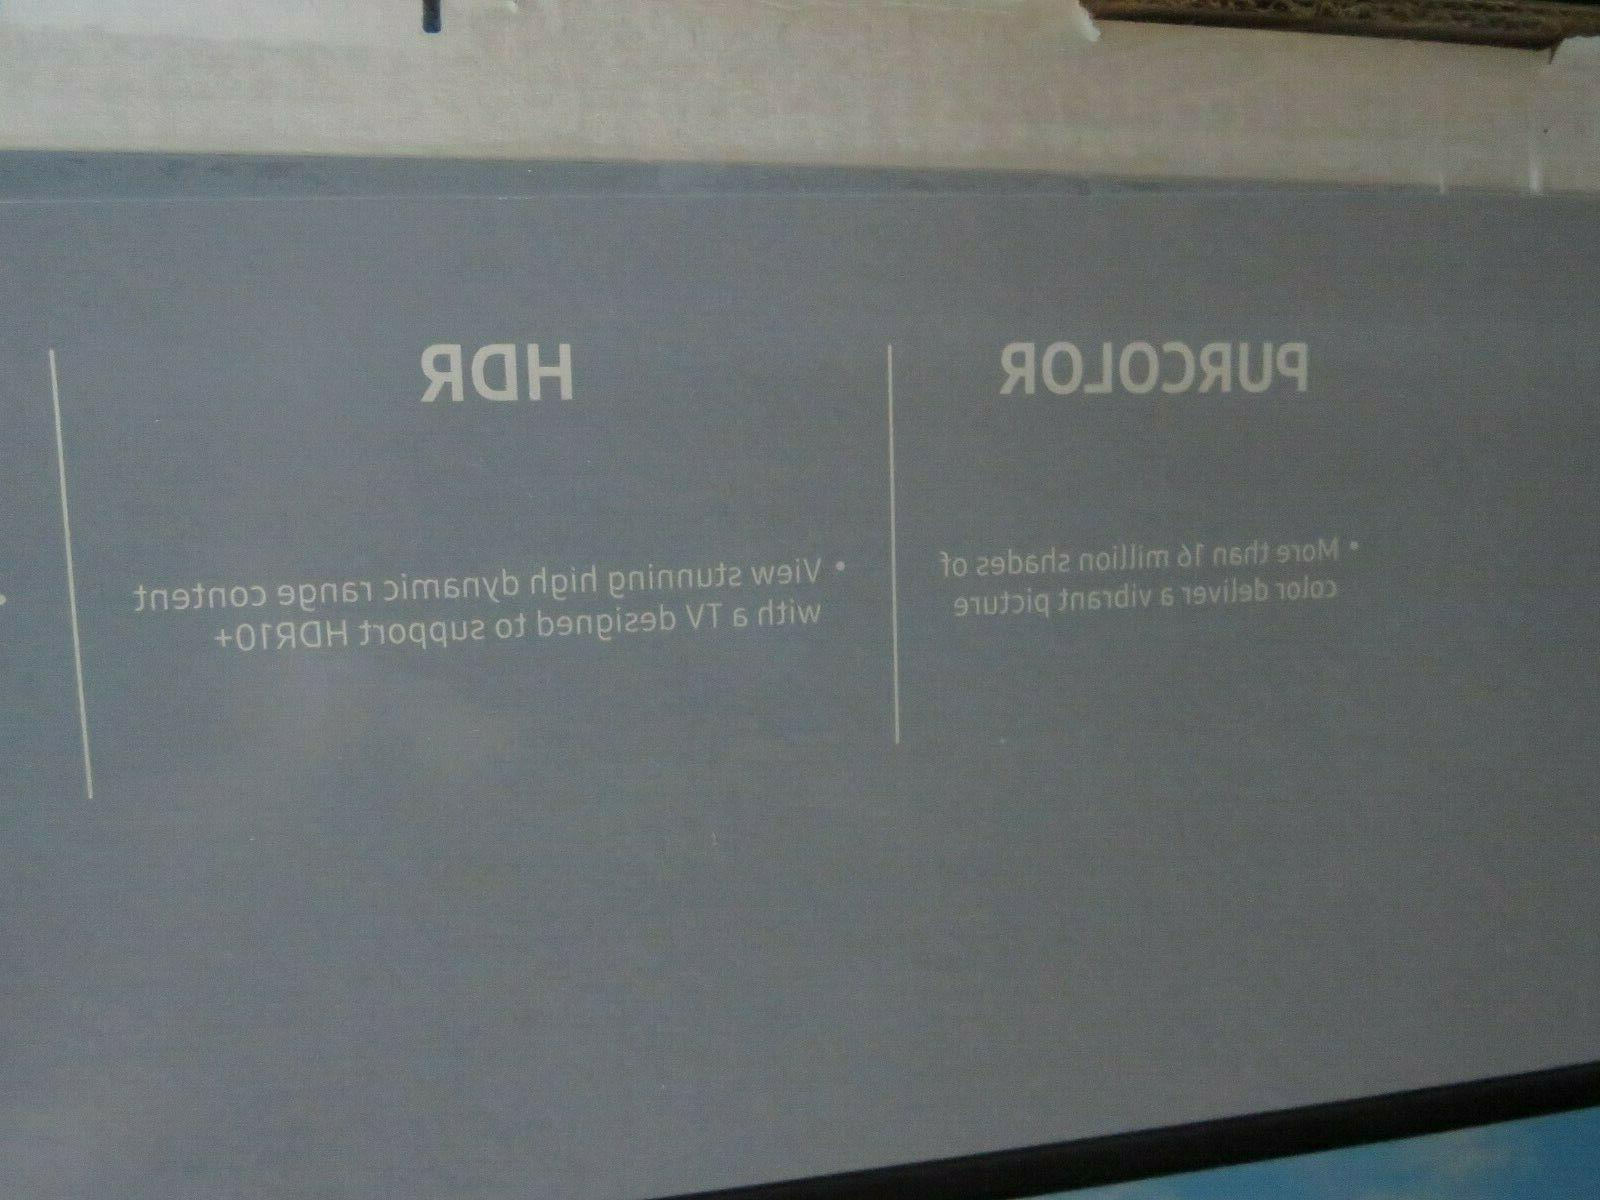 NIB television Samsung UHDTV Flat screen